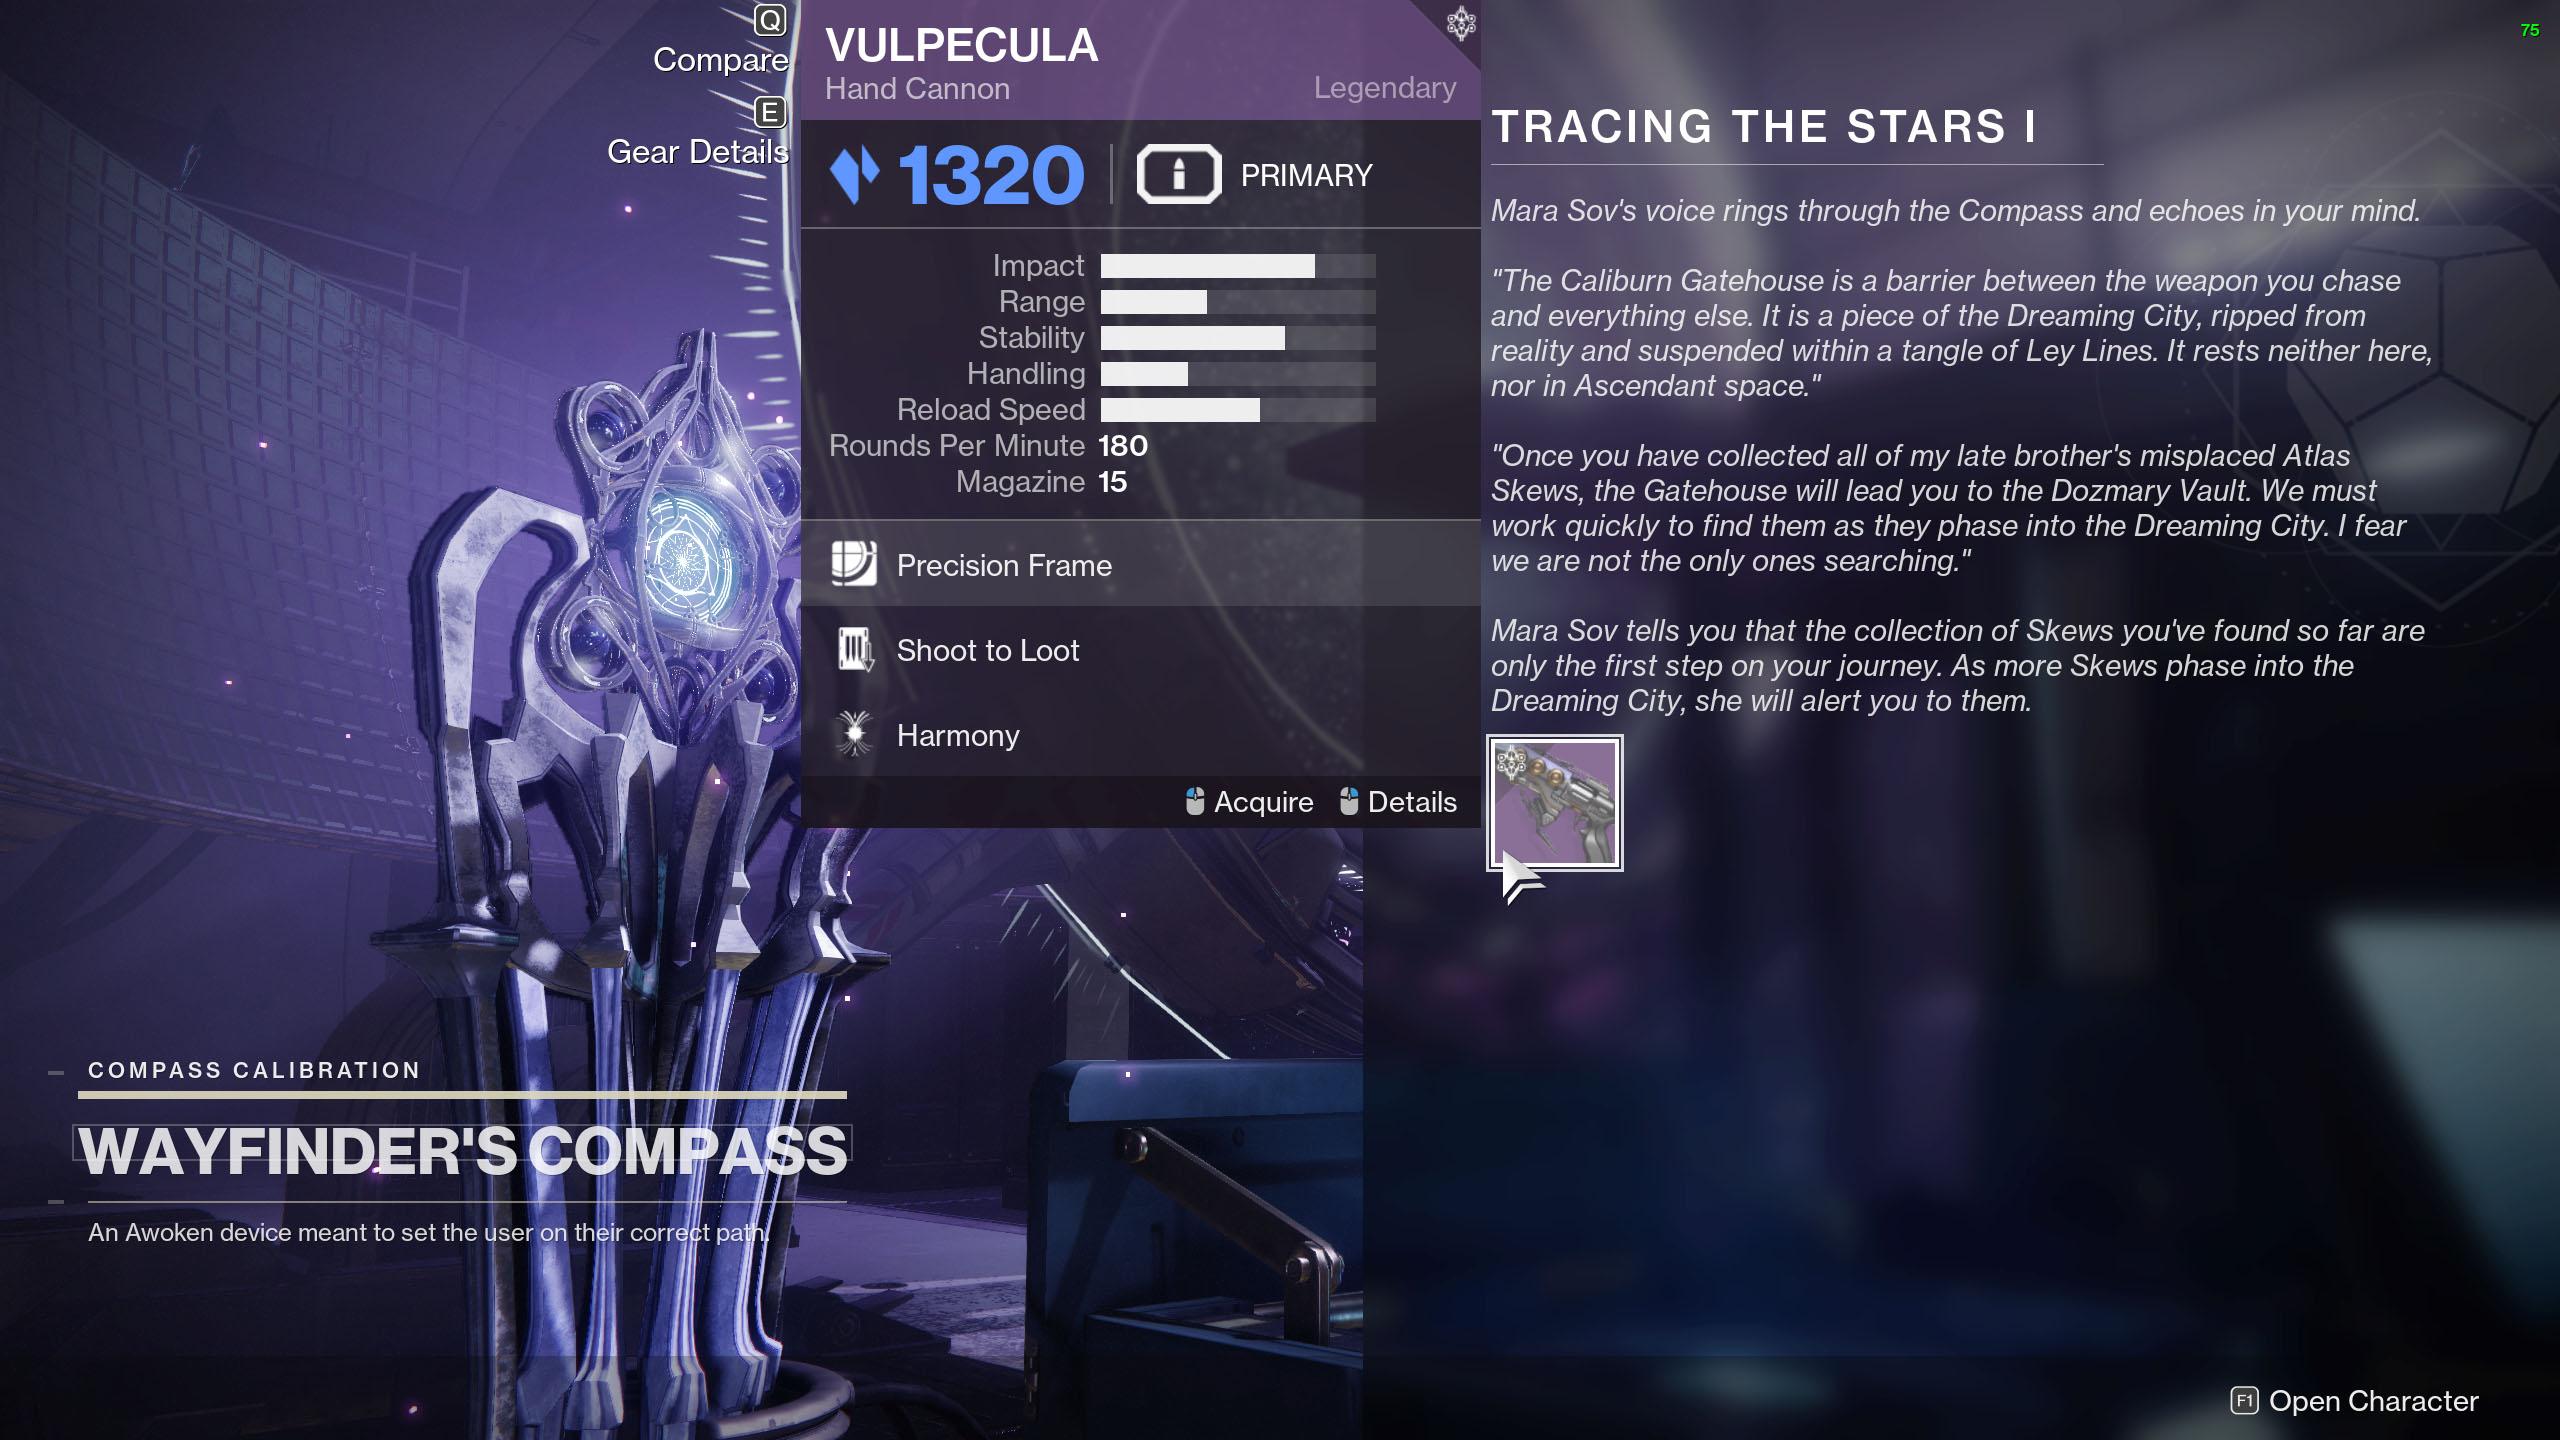 destiny 2 tracing the stars part 1